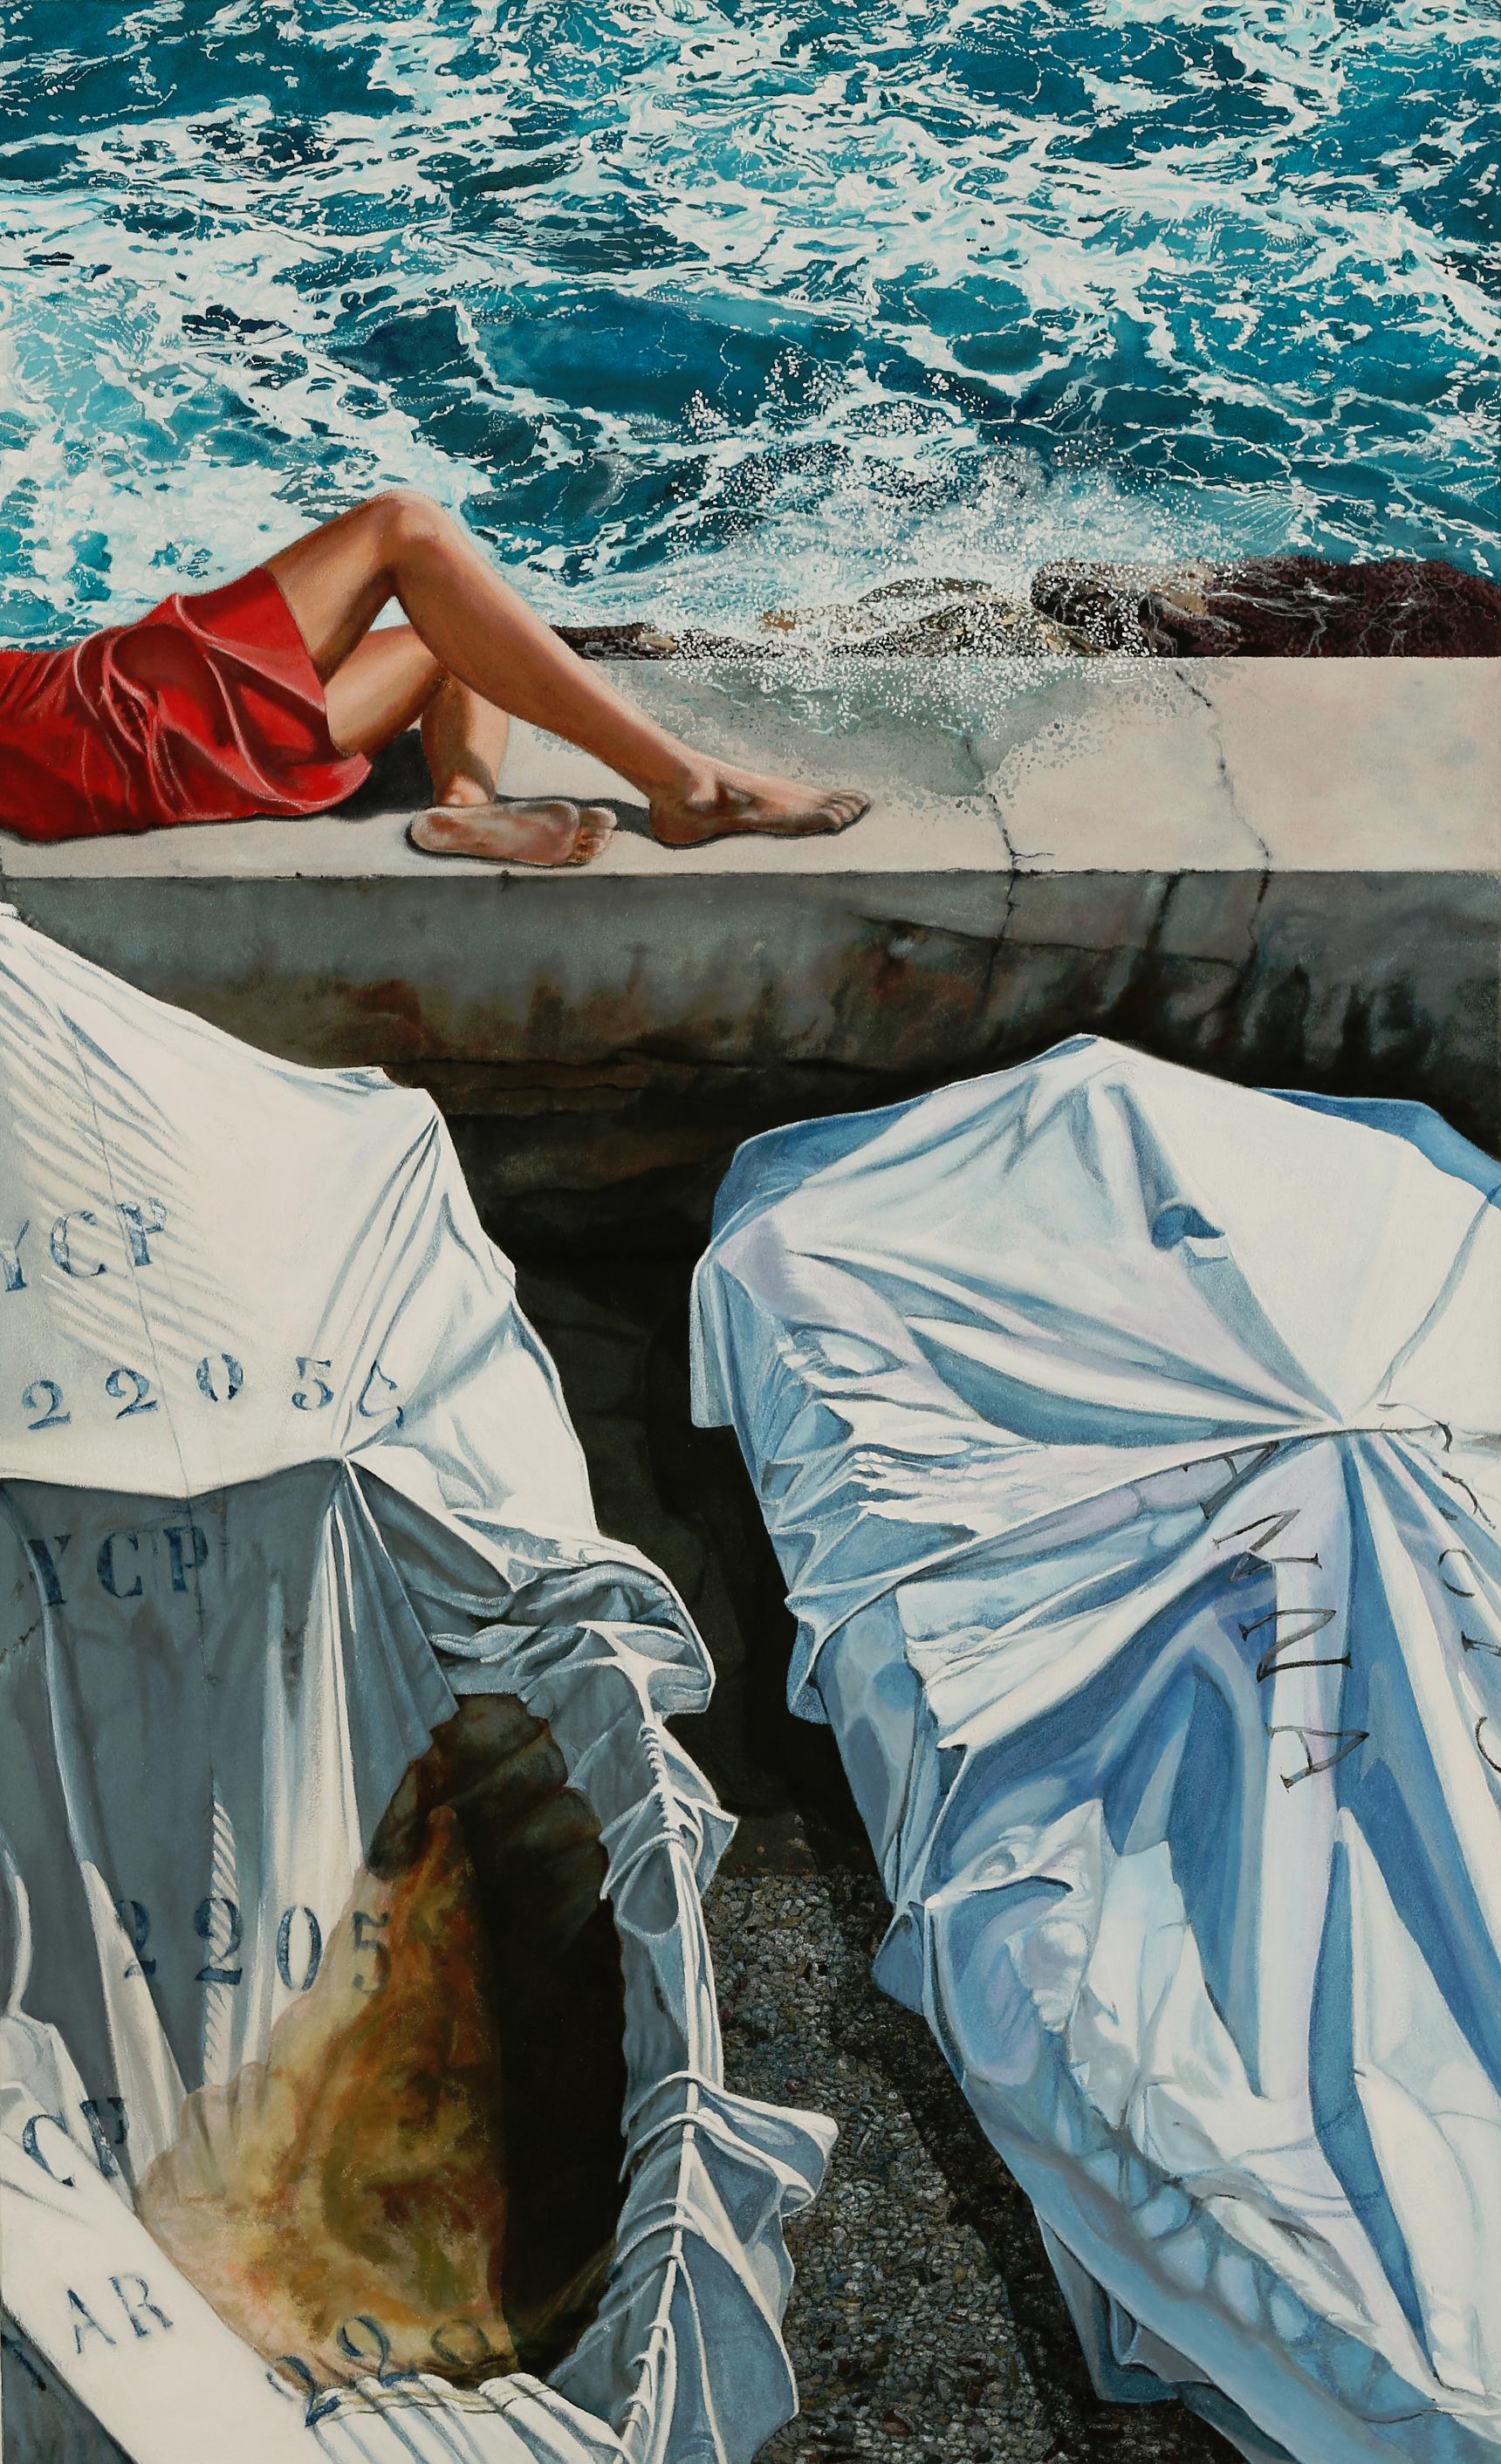 Peinture hyperréalisme Hervé Bernard : She doesnt care